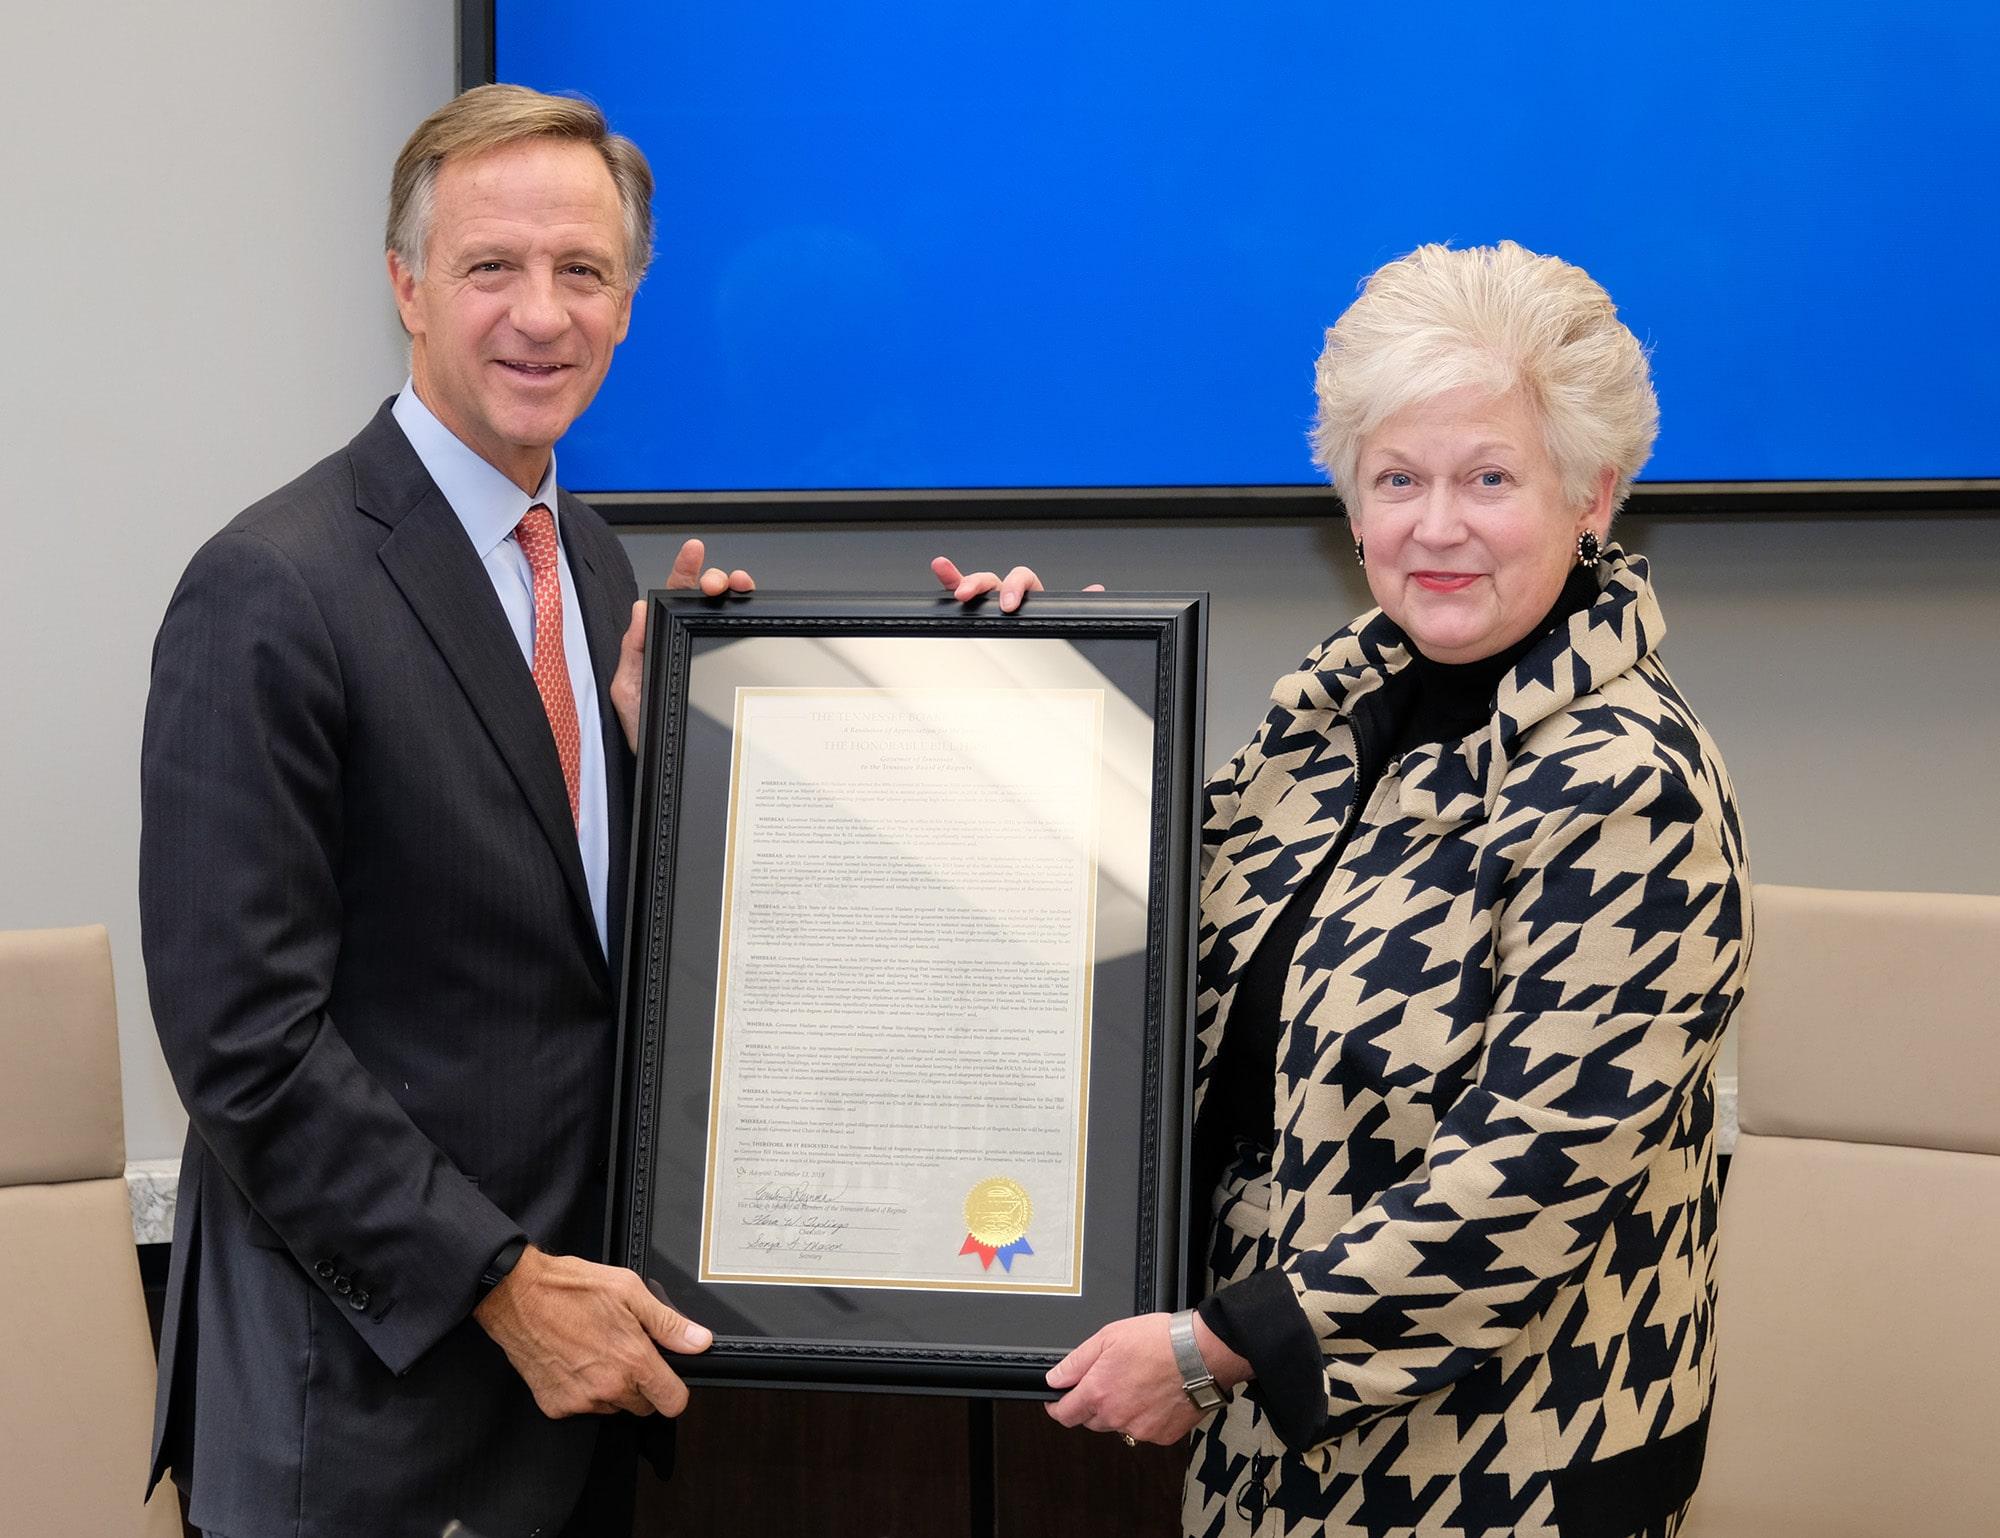 Board of Regents honors Gov. Bill Haslam, hears update on new Warranty program, approves new technical programs